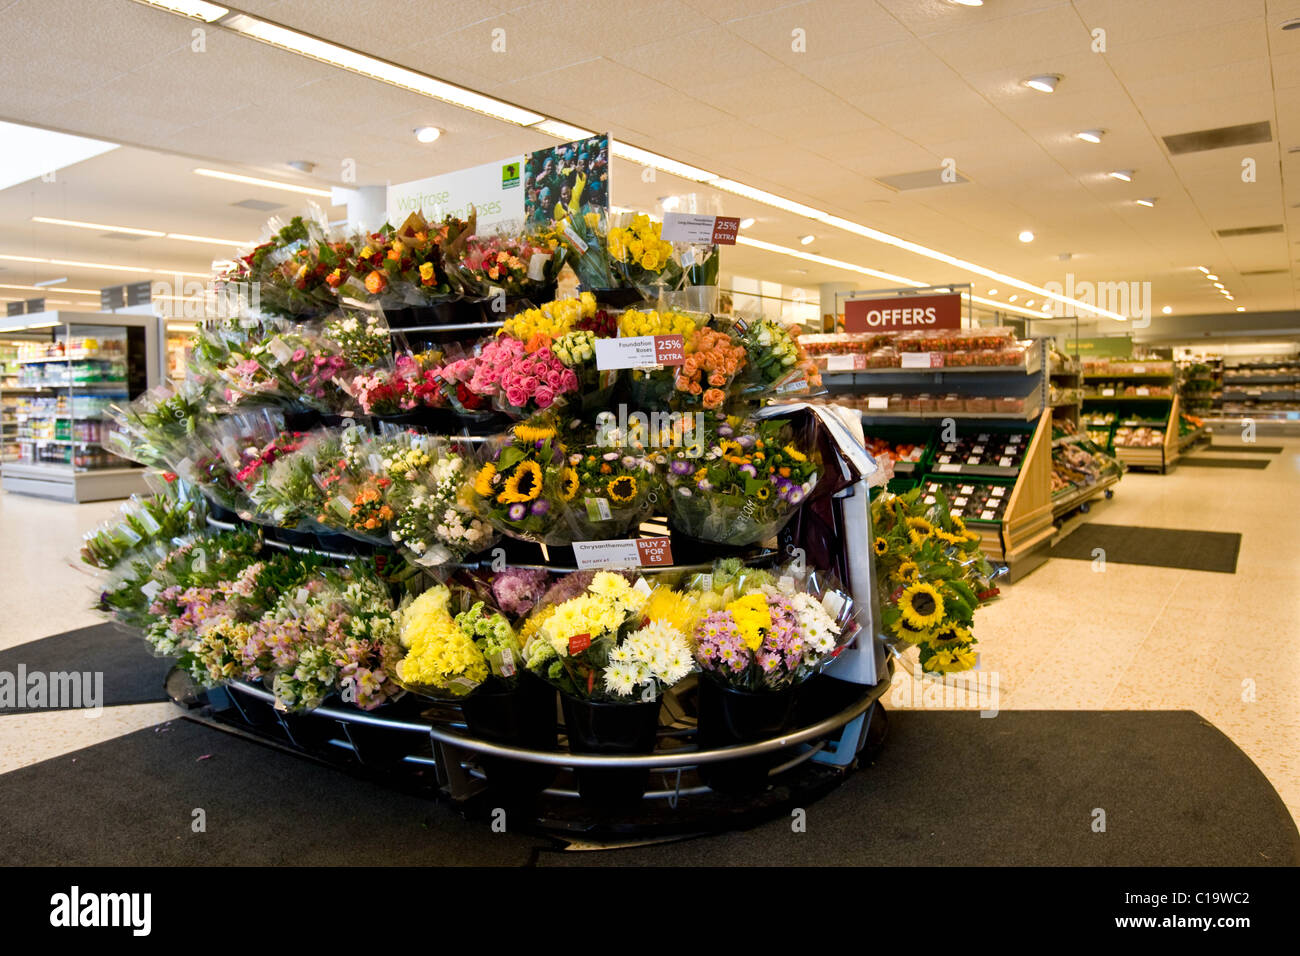 Display flowers stock photos display flowers stock images alamy cut flowers displayed inside a waitrose super market stock image izmirmasajfo